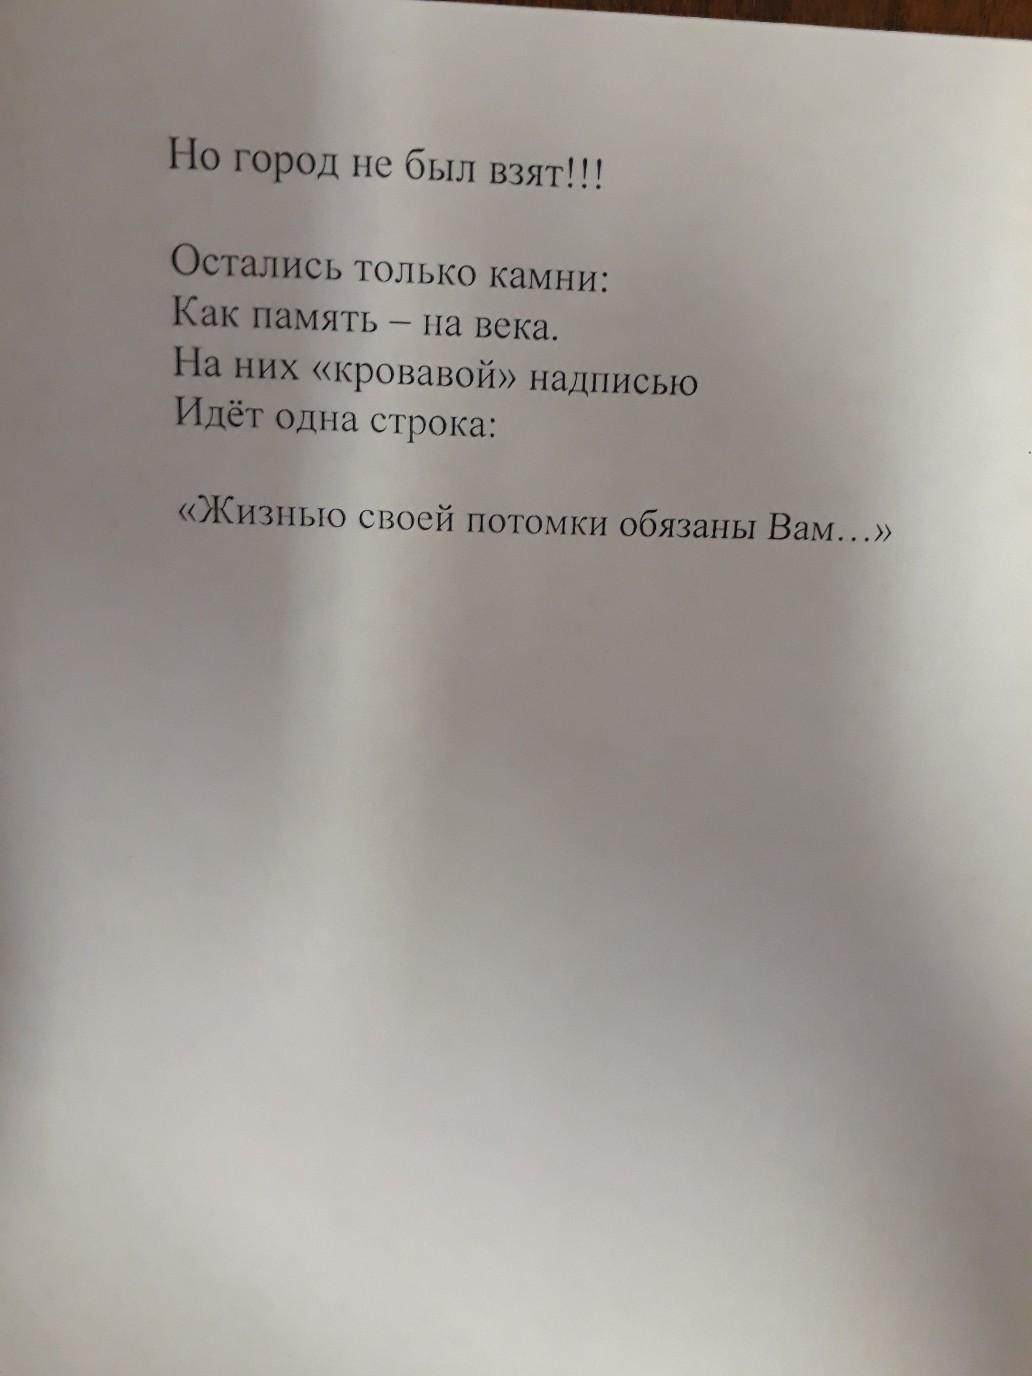 oQAgfovpKhU